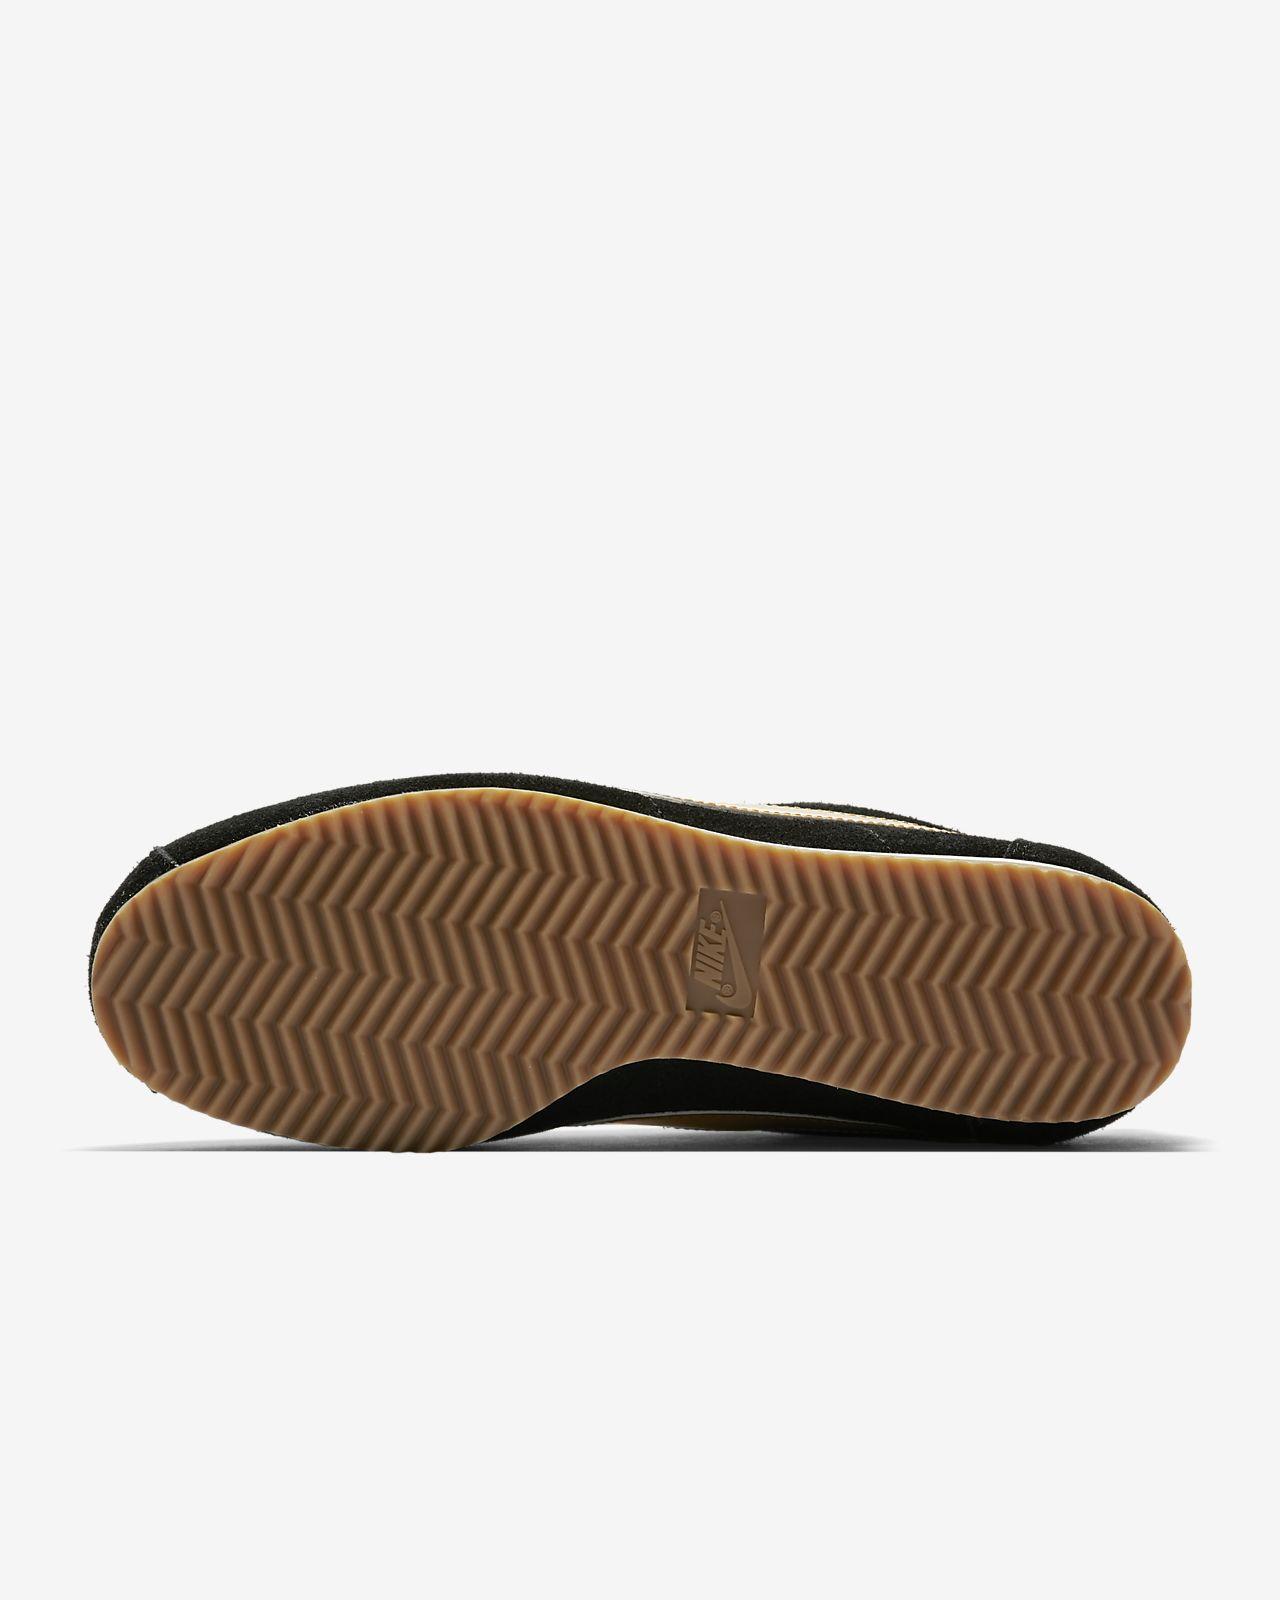 882cb8f3820b Nike Cortez SE Women s Shoe. Nike.com AE